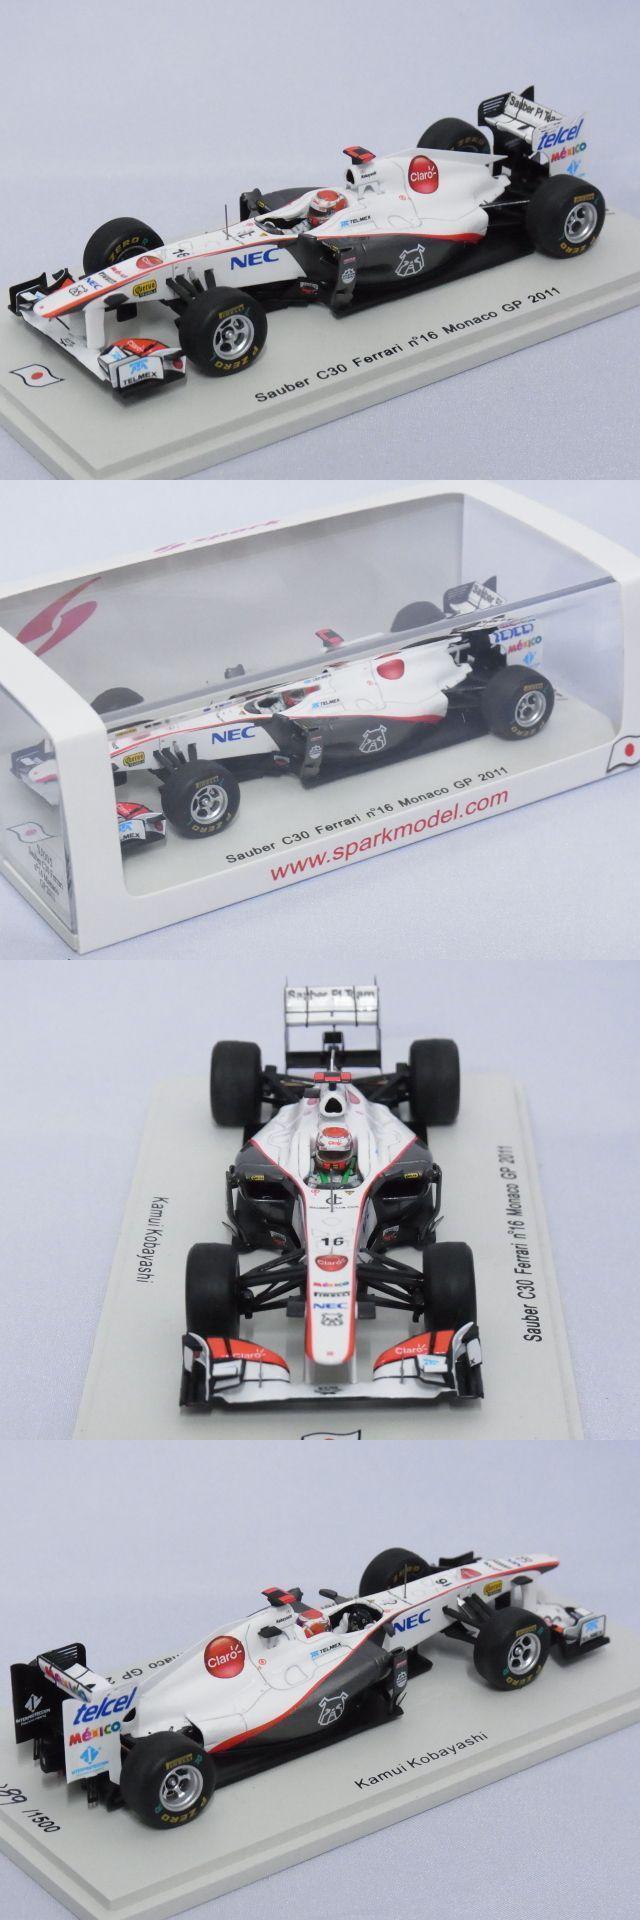 Formula 1 Cars 180270: Sauber C30 Ferrari, Kobayashi 2011 Monaco Gp Formula 1, Spark Sj005 Resin 1 43 -> BUY IT NOW ONLY: $35.99 on eBay!